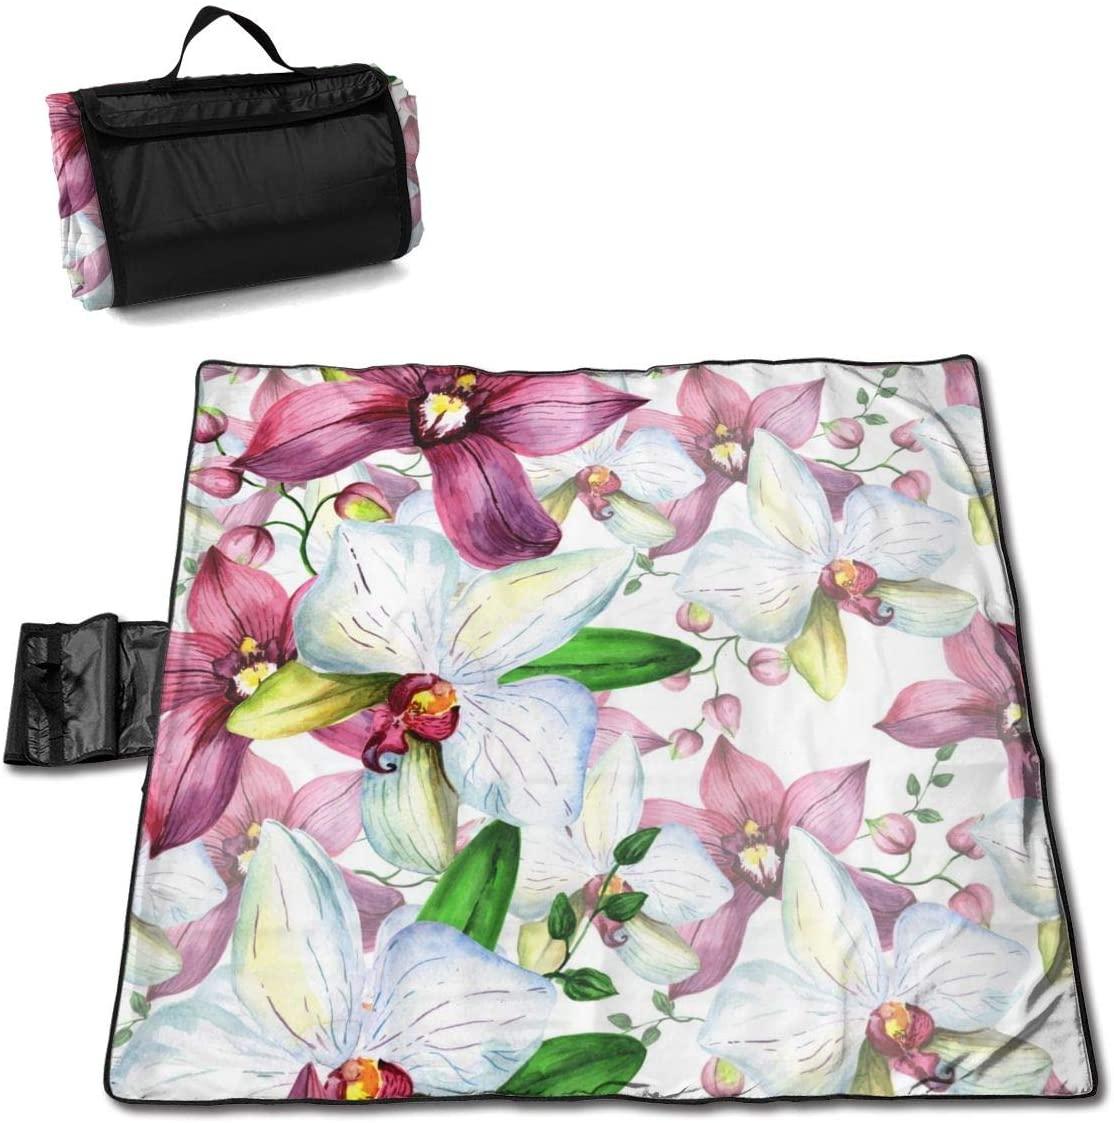 HONGSH Outdoor Picnic Blanket,Beach Blanket, Wildflower Orchid Flower Beach Mat, Waterproof Sandproof Foldable Picnic Mat, Portable Outdoor Beach Blanket for Beaches,Camping,Hiking Picnic